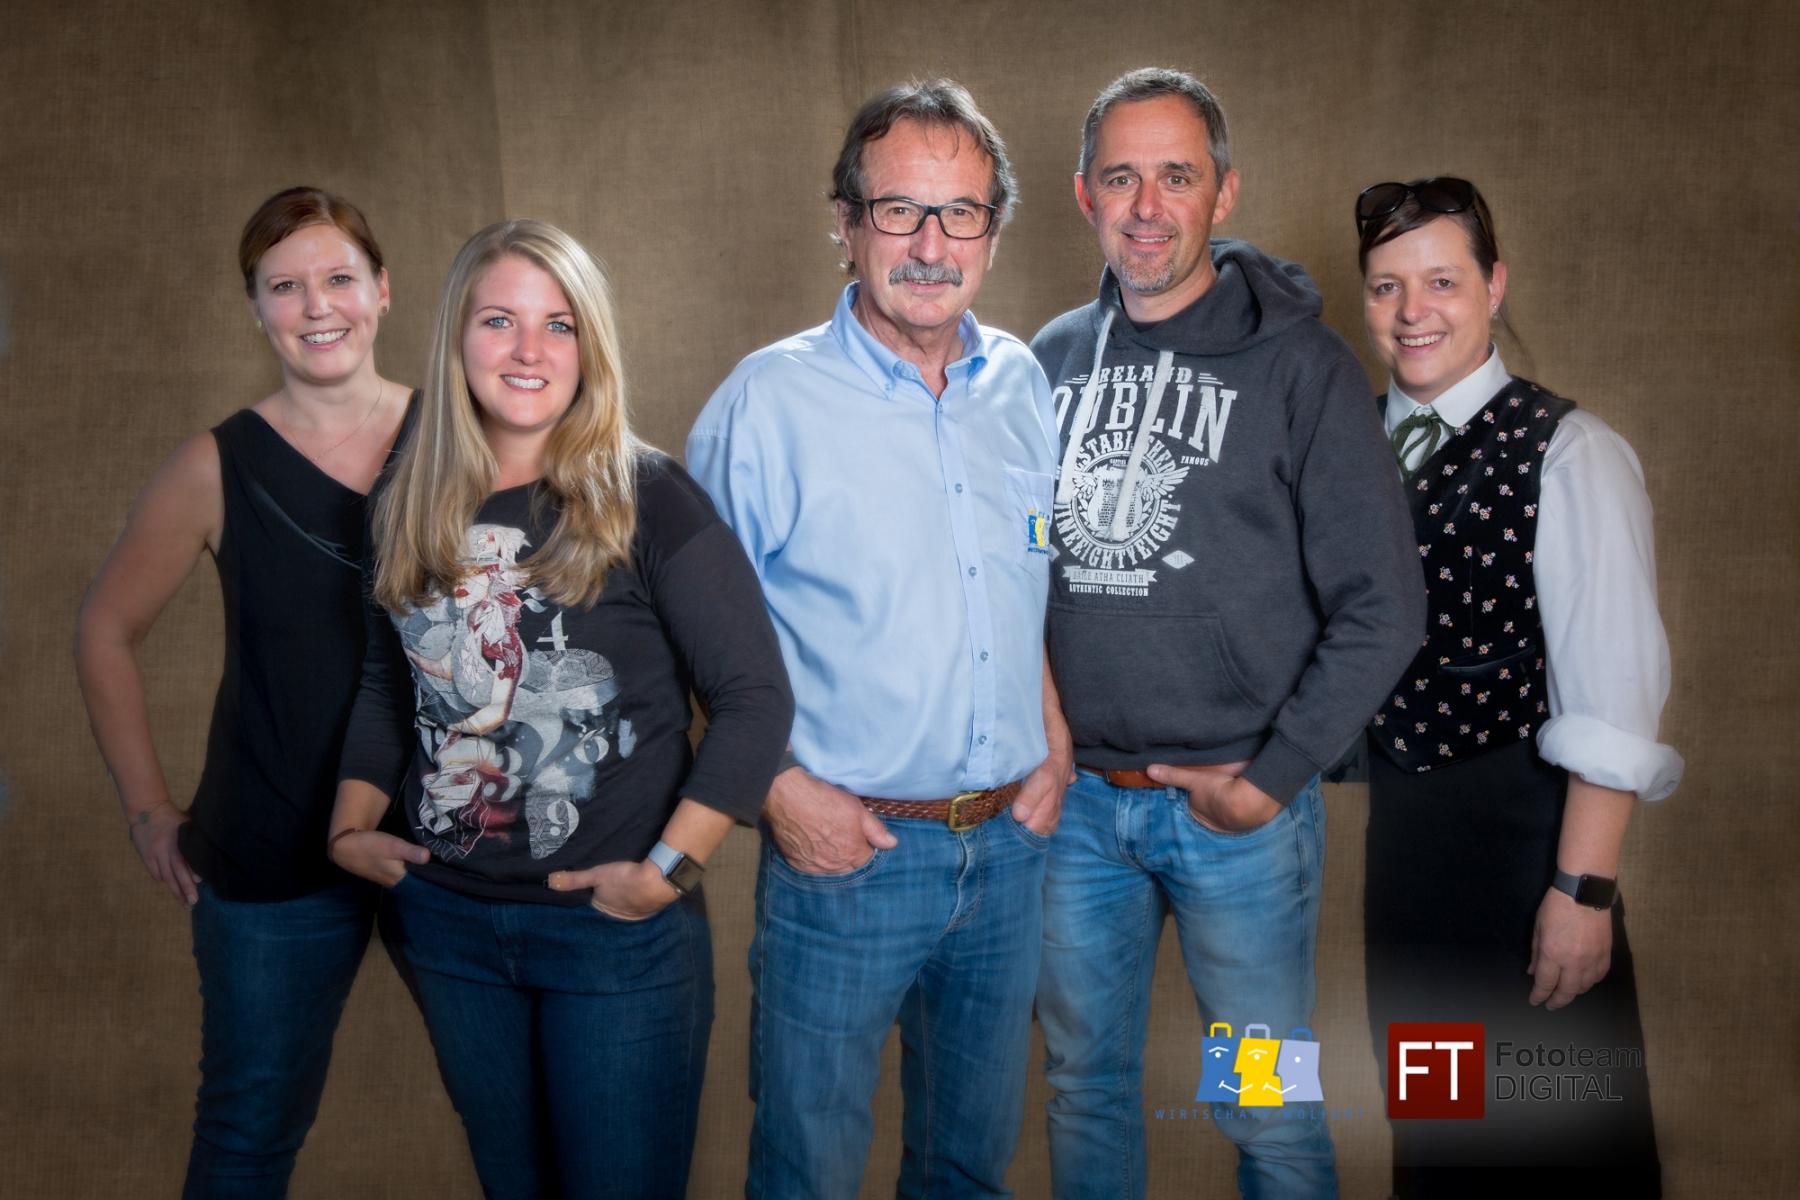 1116_Wolfurter Herbstmarkt@Fototeam Digital 2018-Bearbeitet